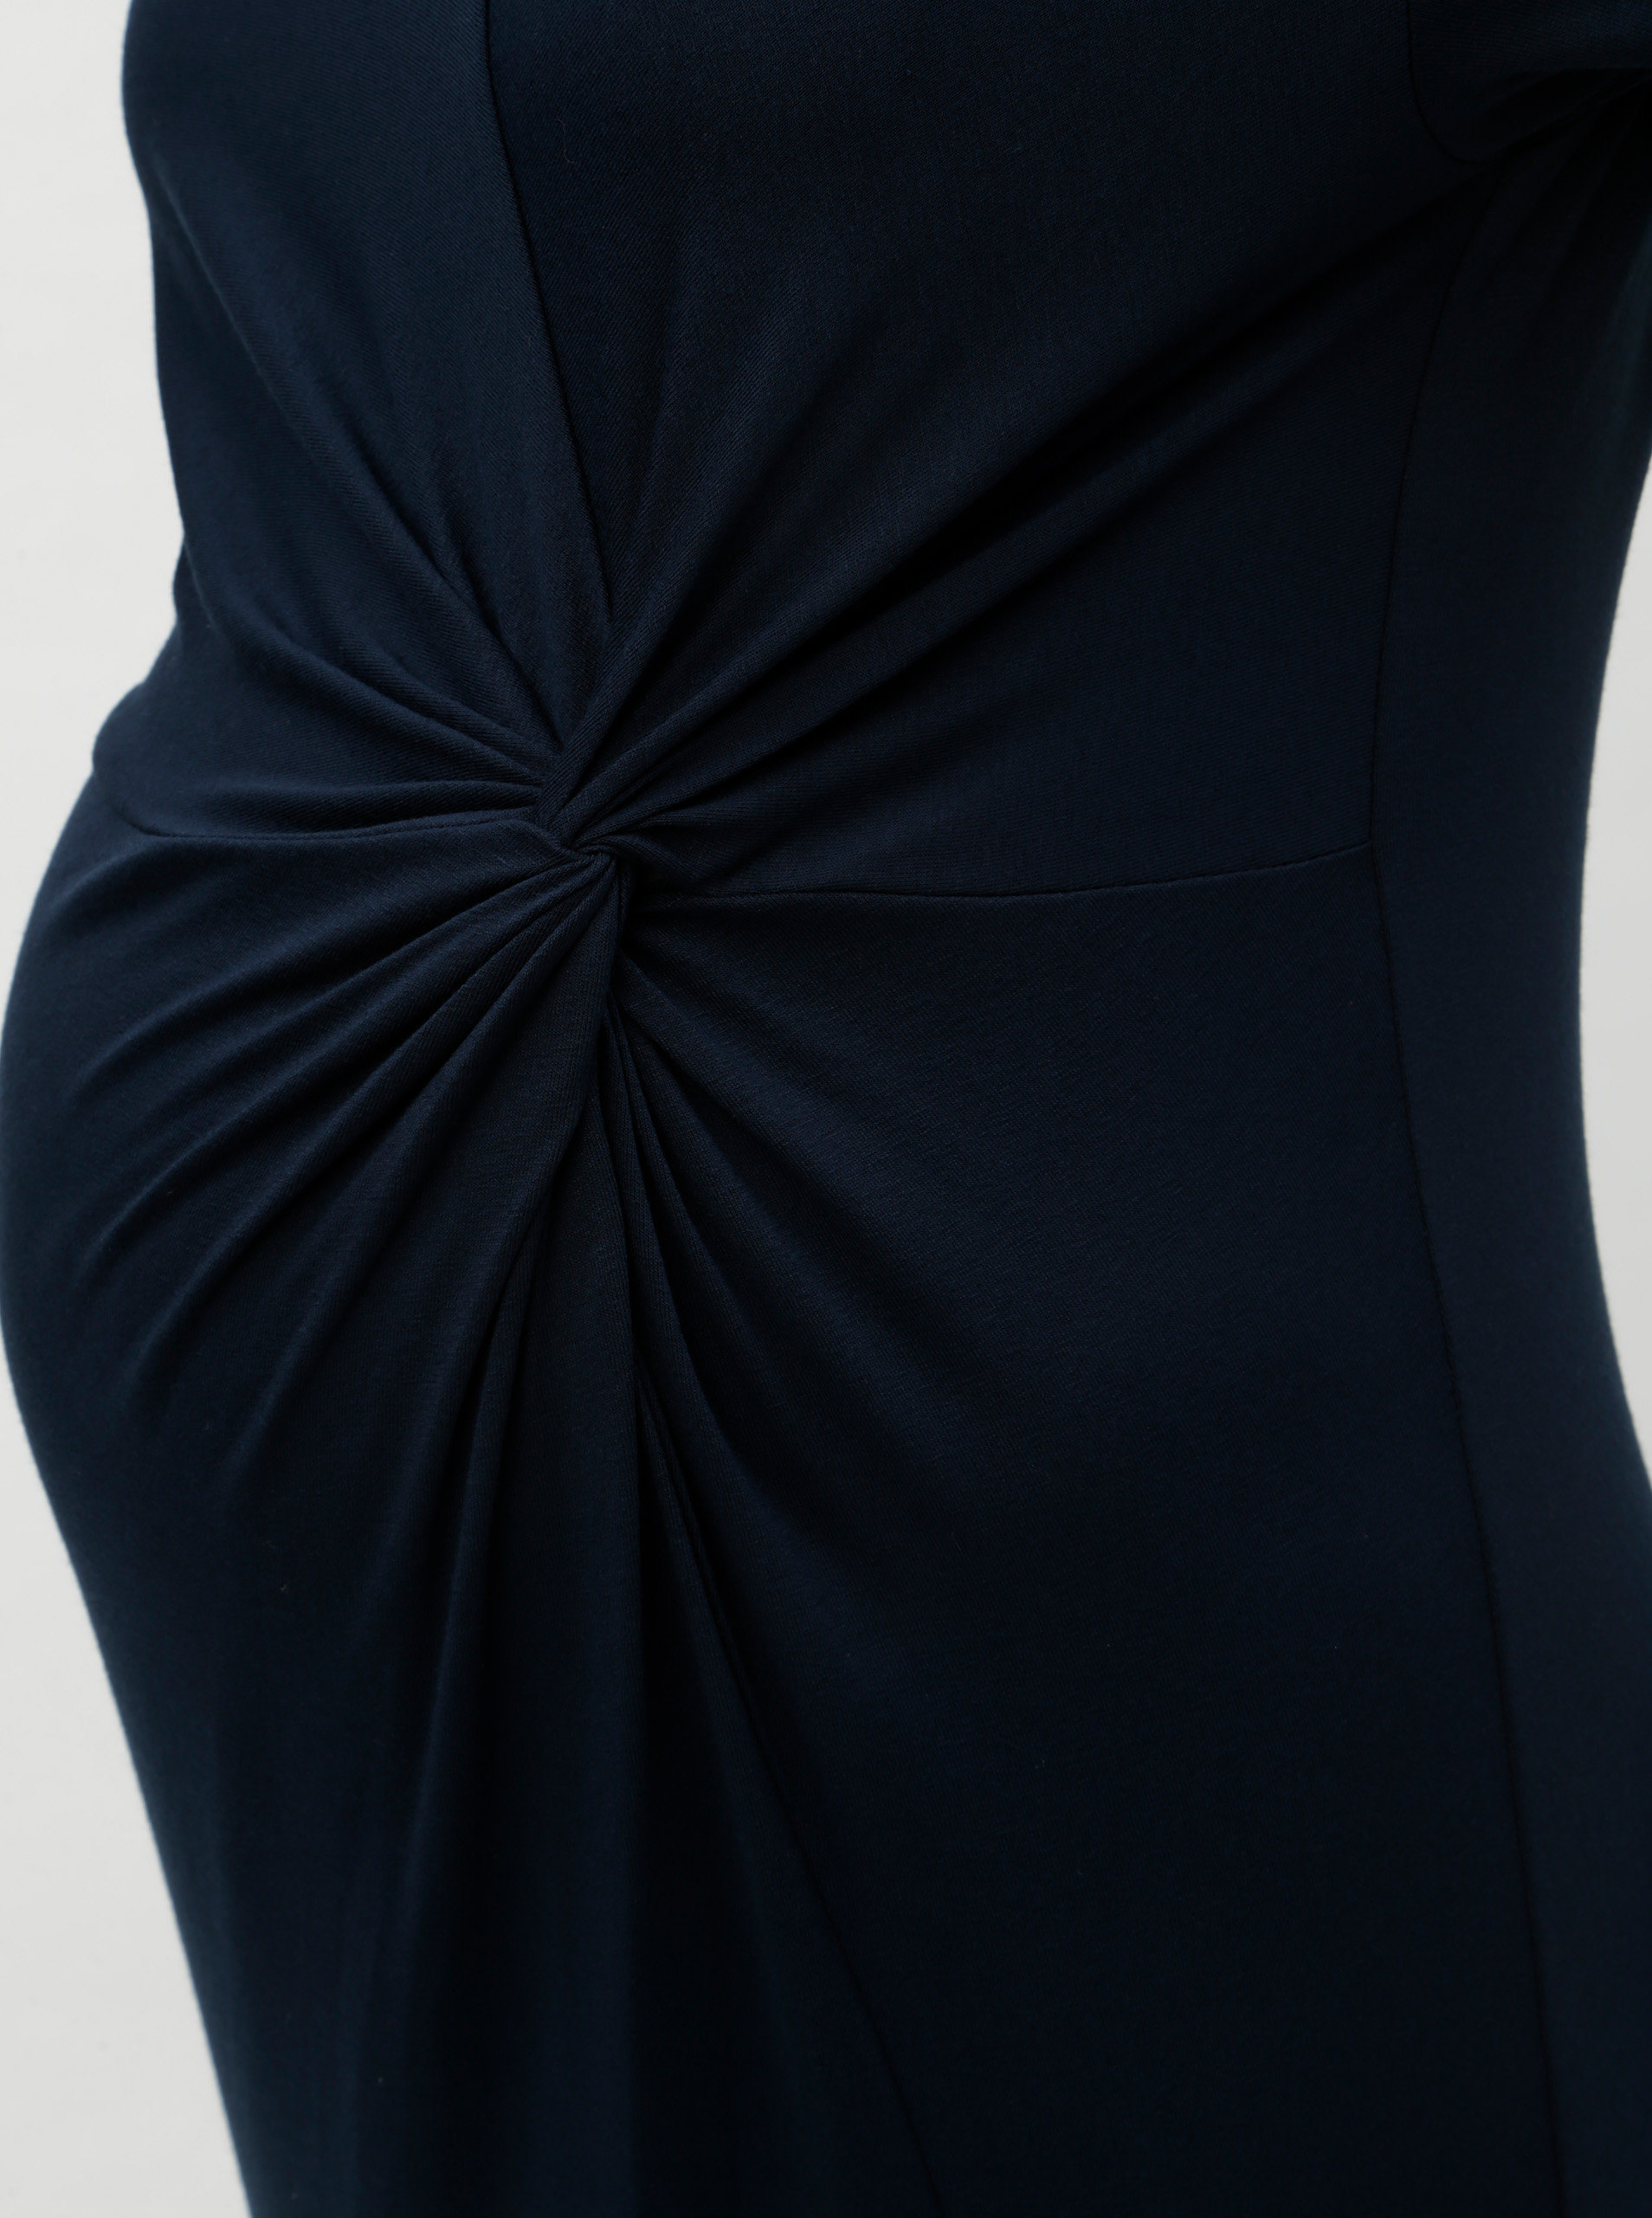 a8fadf34e4de Tmavomodré tehotenské šaty Dorothy Perkins Maternity ...